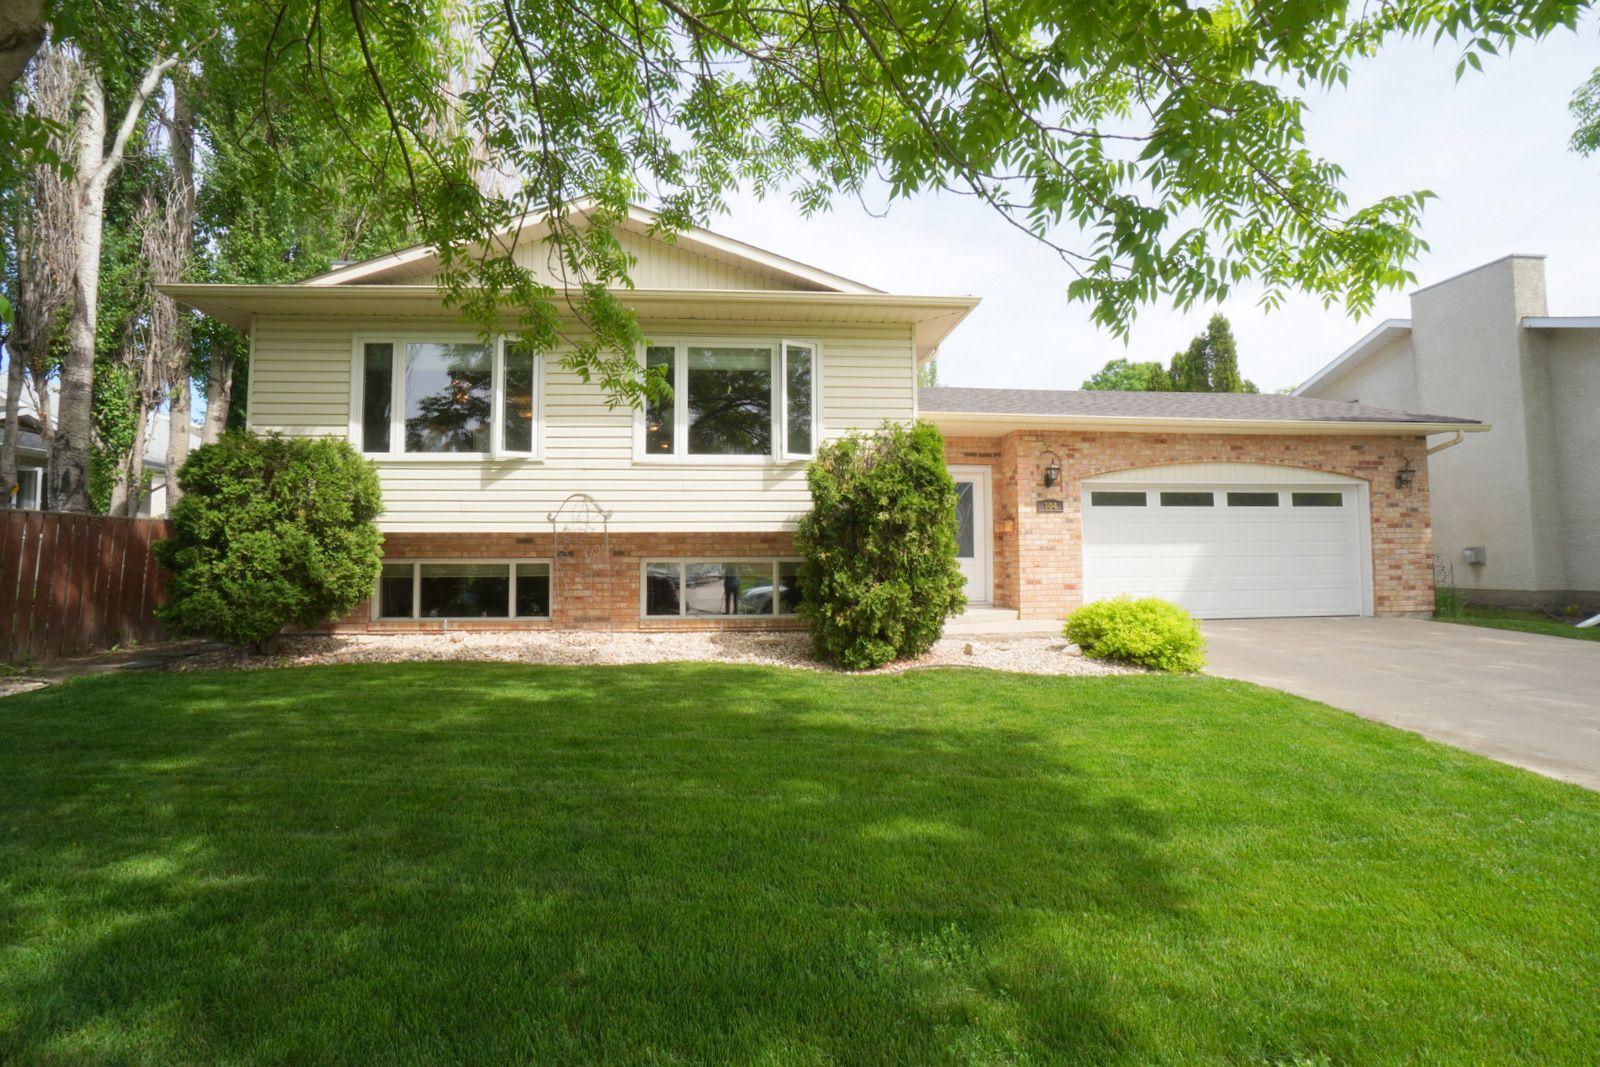 Main Photo: 104 Meighen Avenue in Portage la Prairie: House for sale : MLS®# 202114338